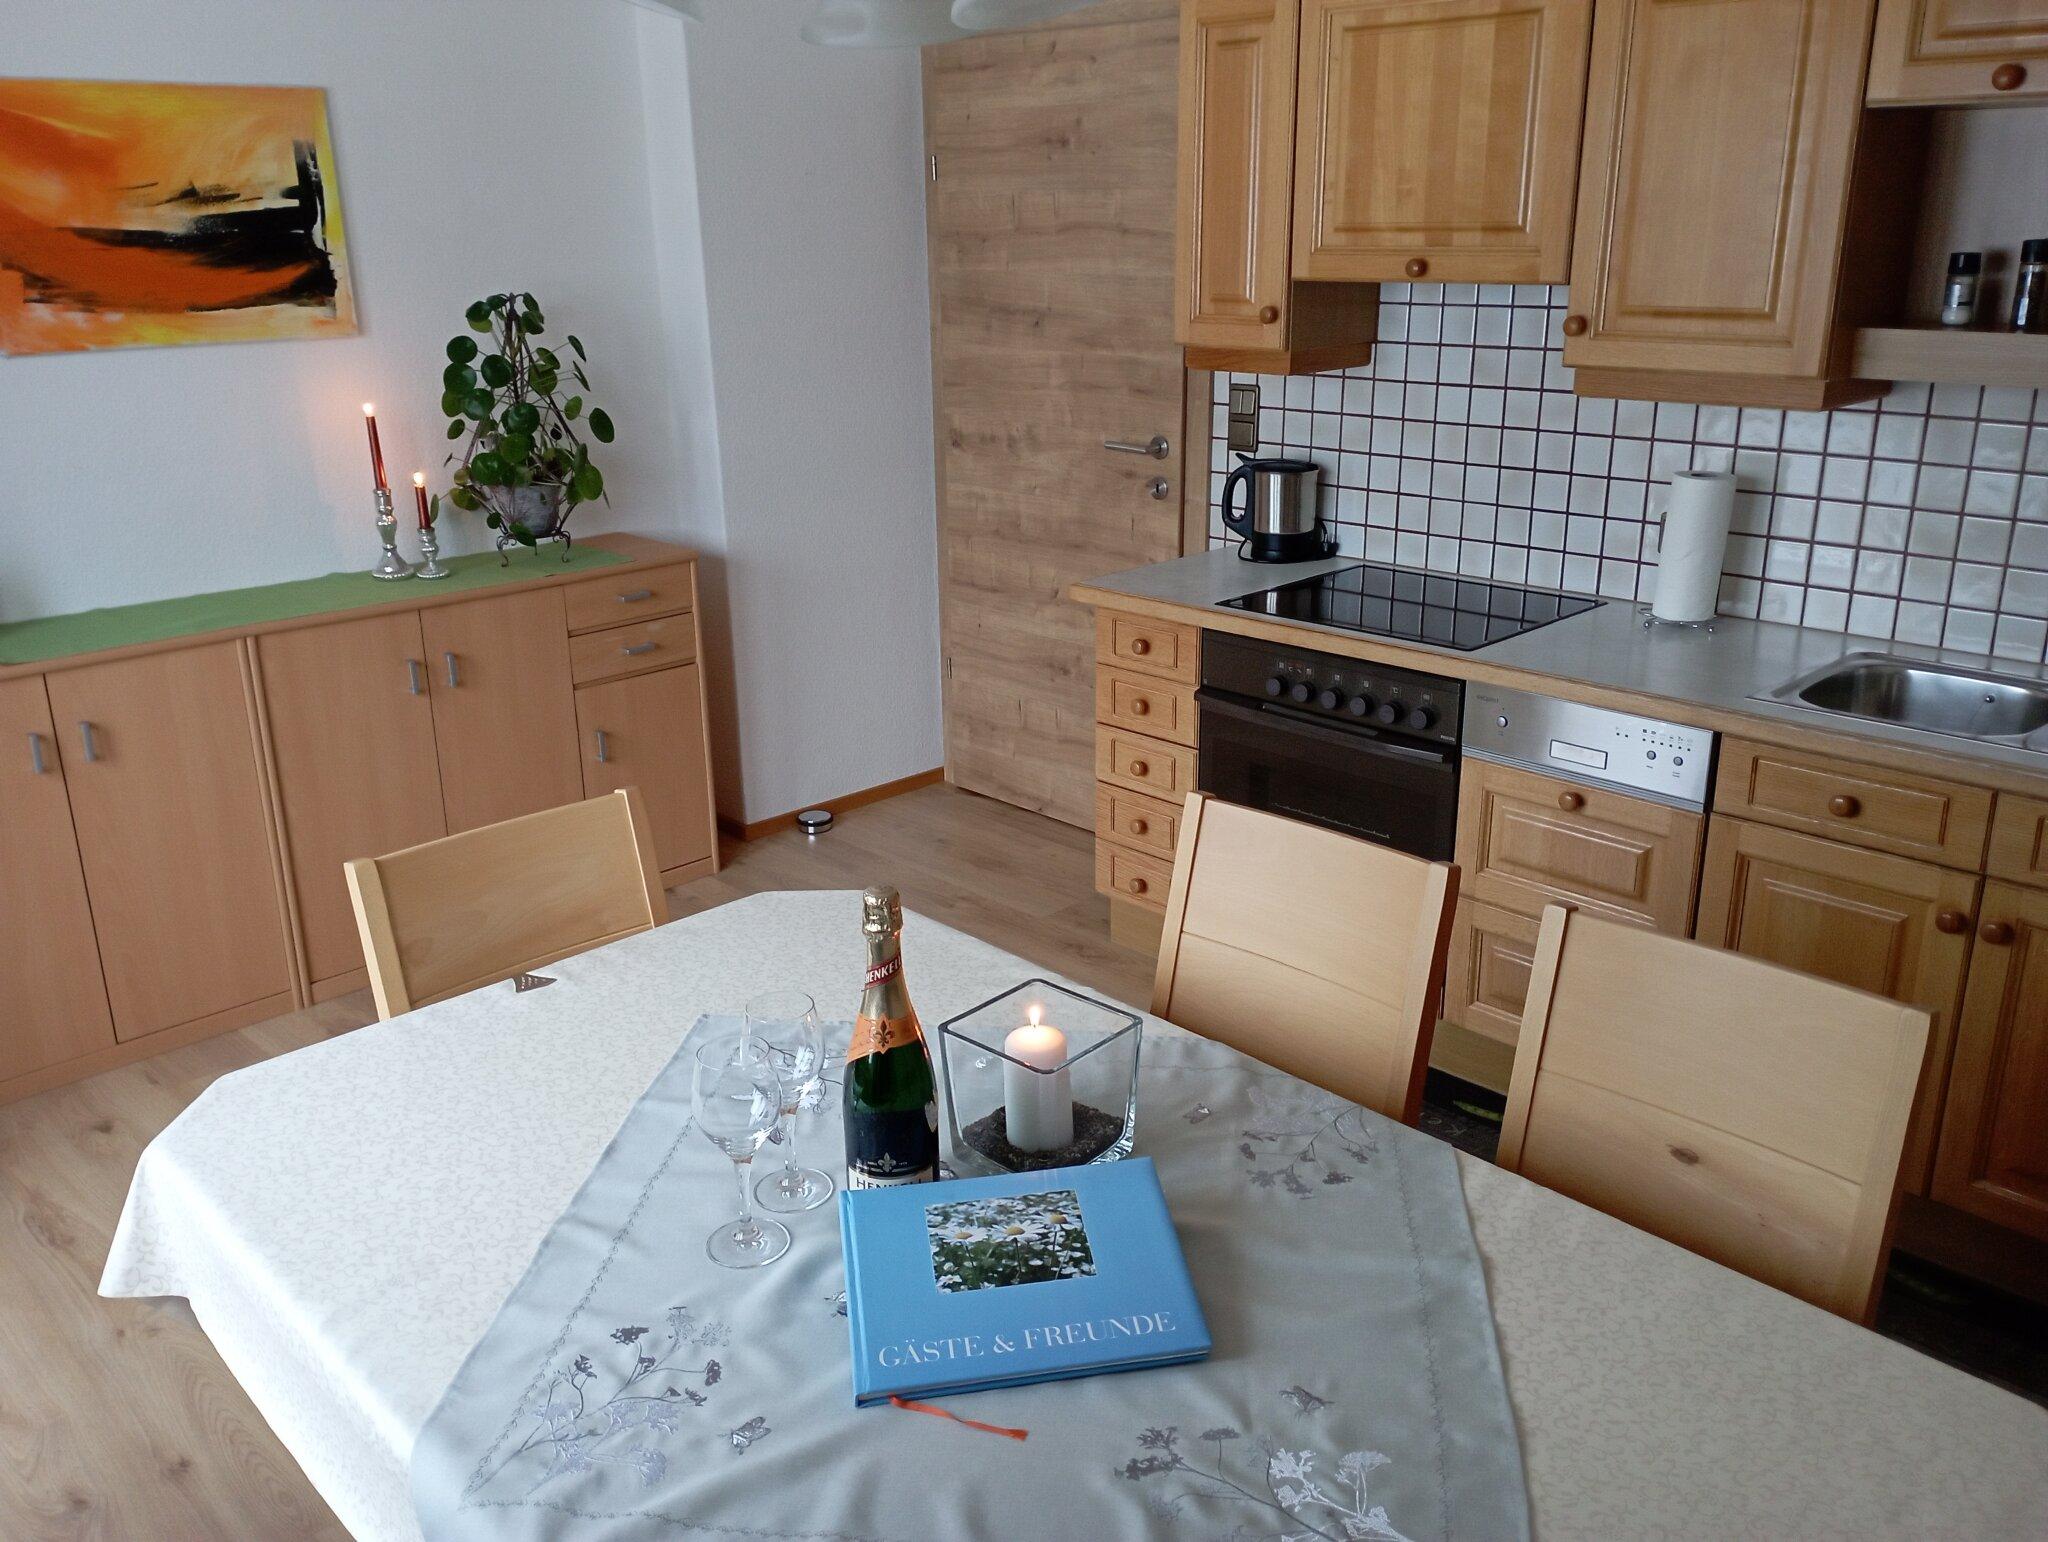 Eckbank in Küche